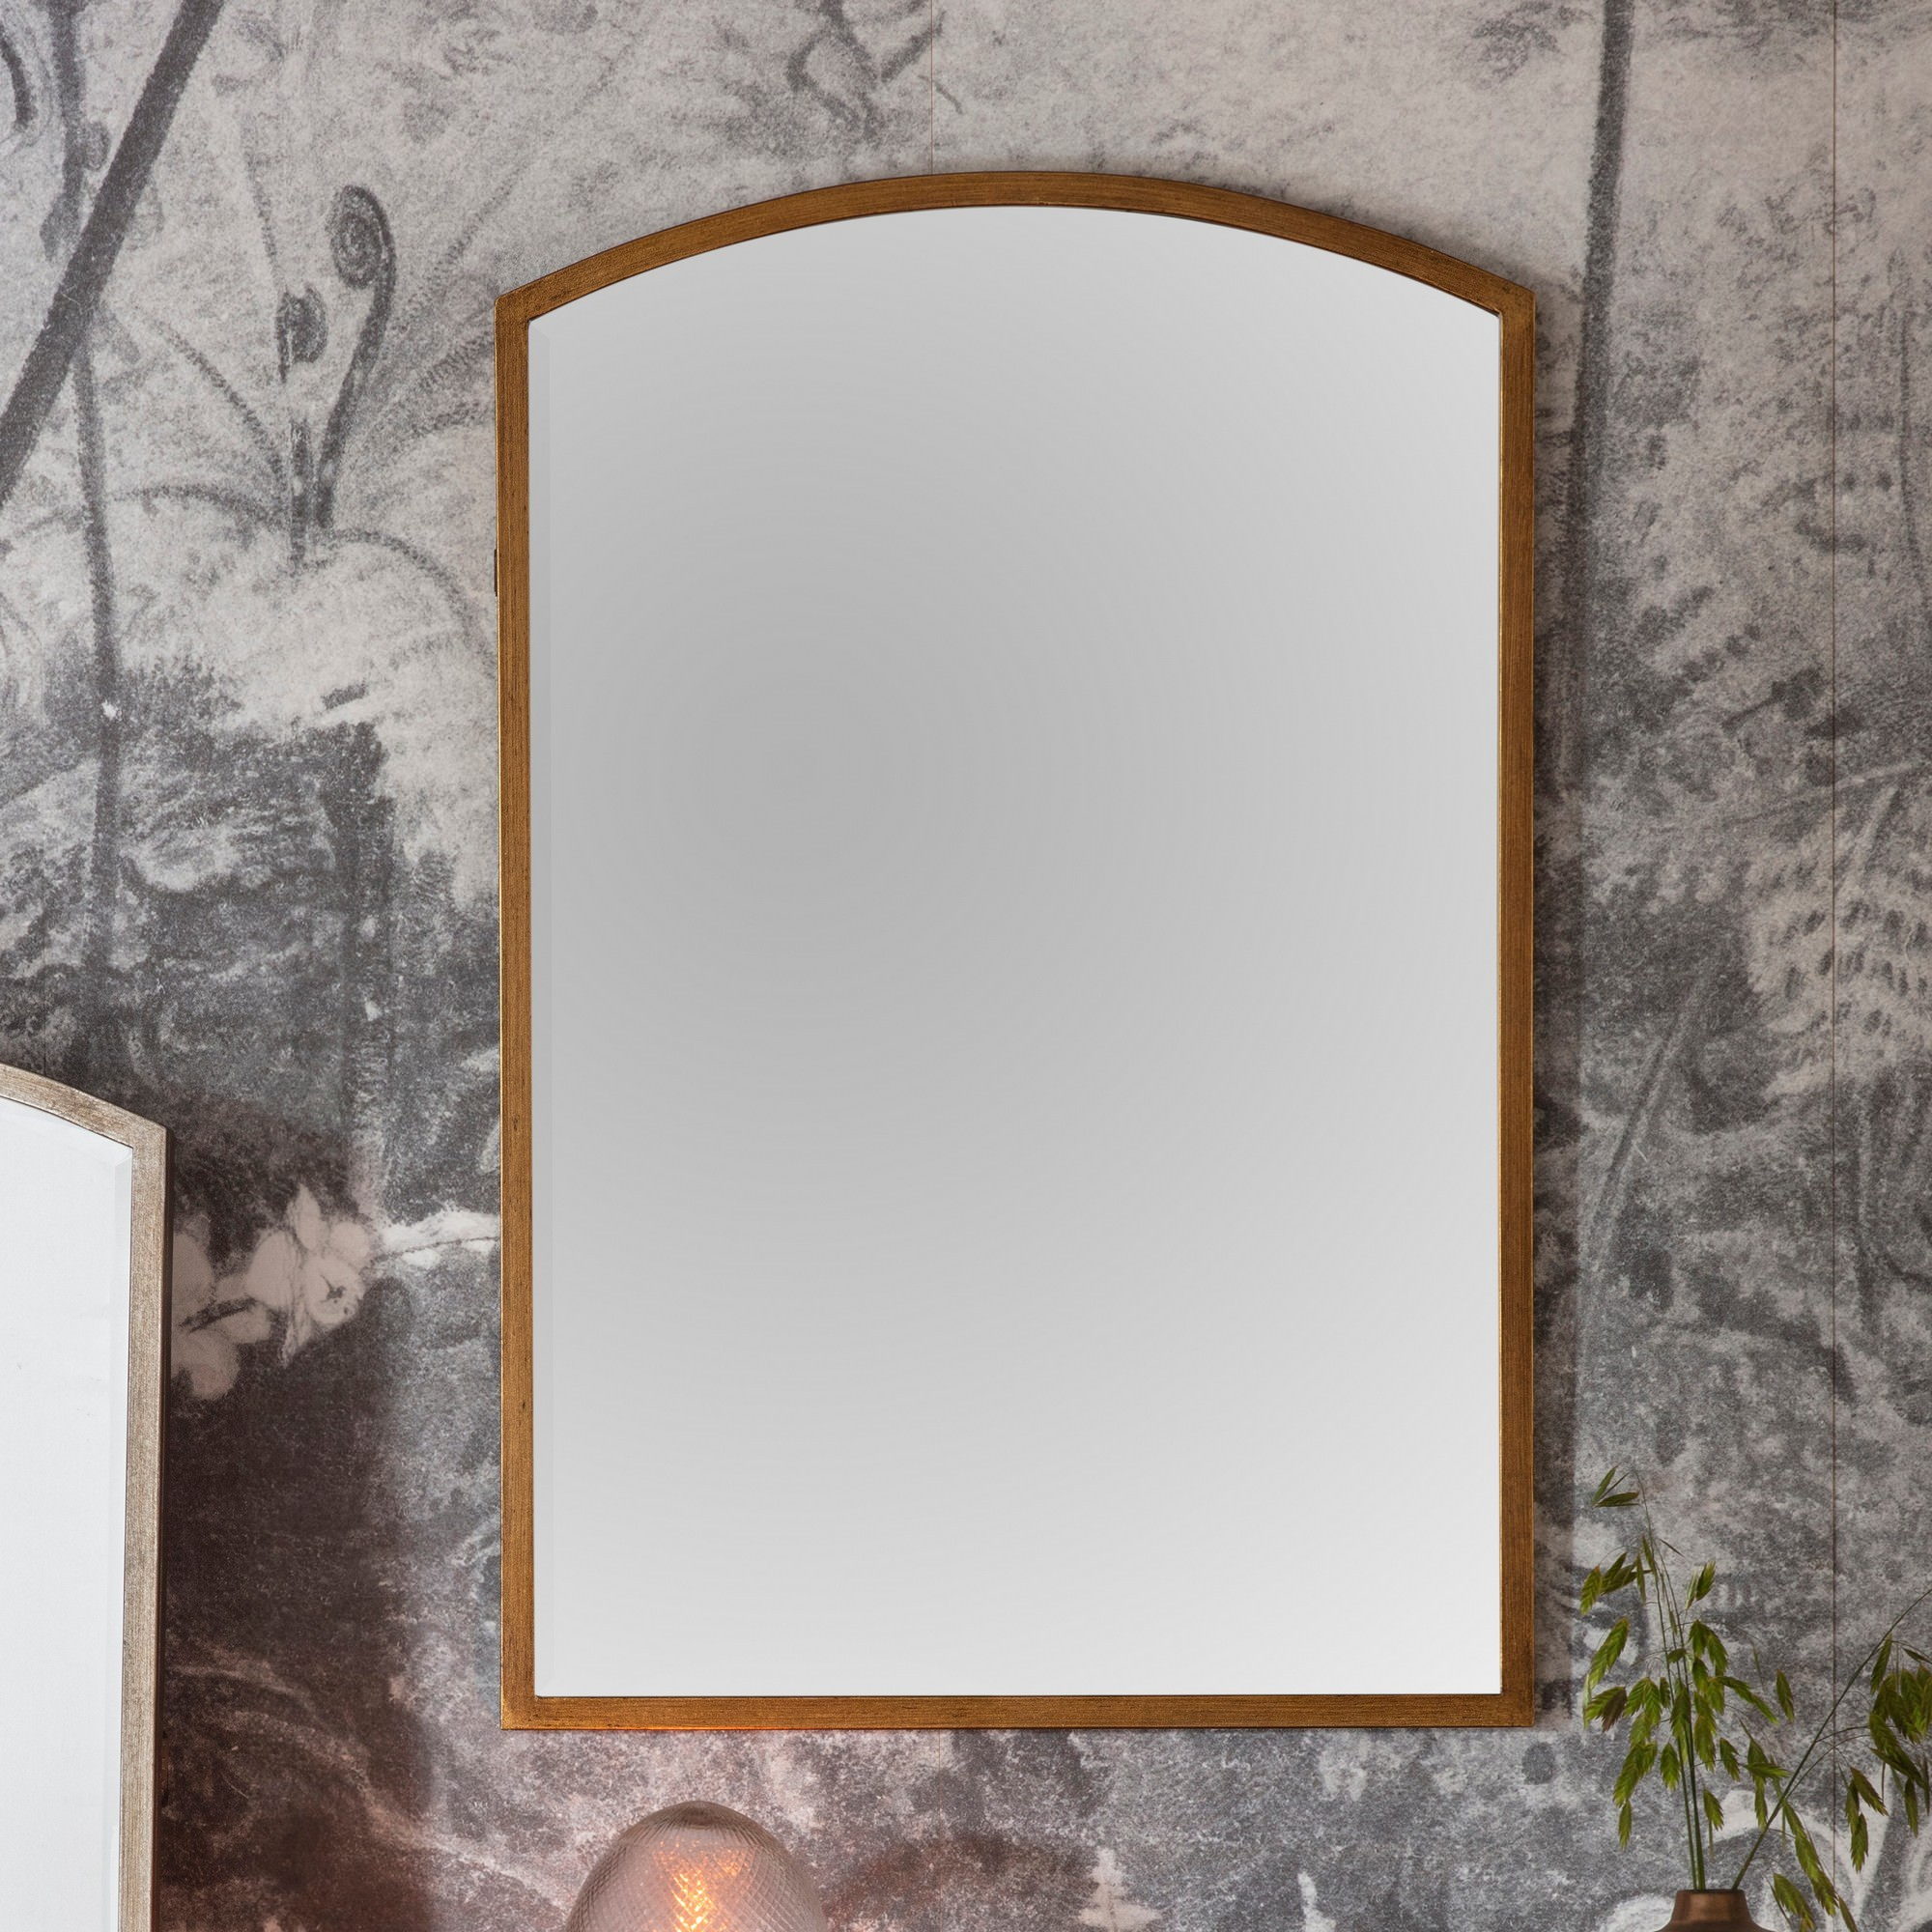 Hamill Metal Frame Arch Wall Mirror, 90cm, Antique Gold